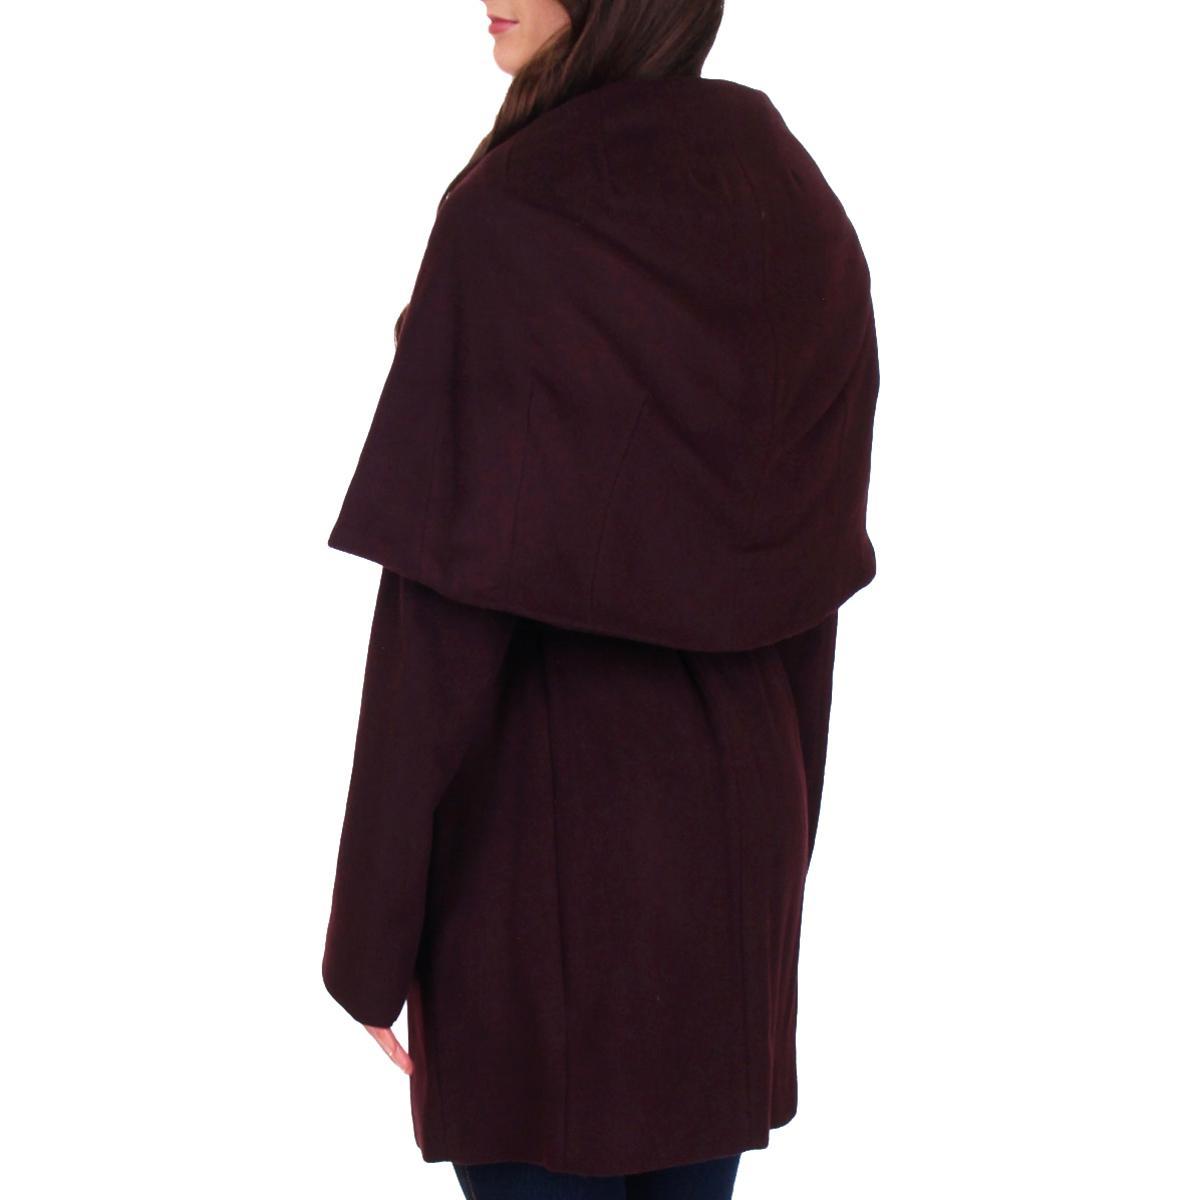 T-Tahari-Marla-Women-s-Oversized-Collar-Wool-Wrap-Coat thumbnail 4